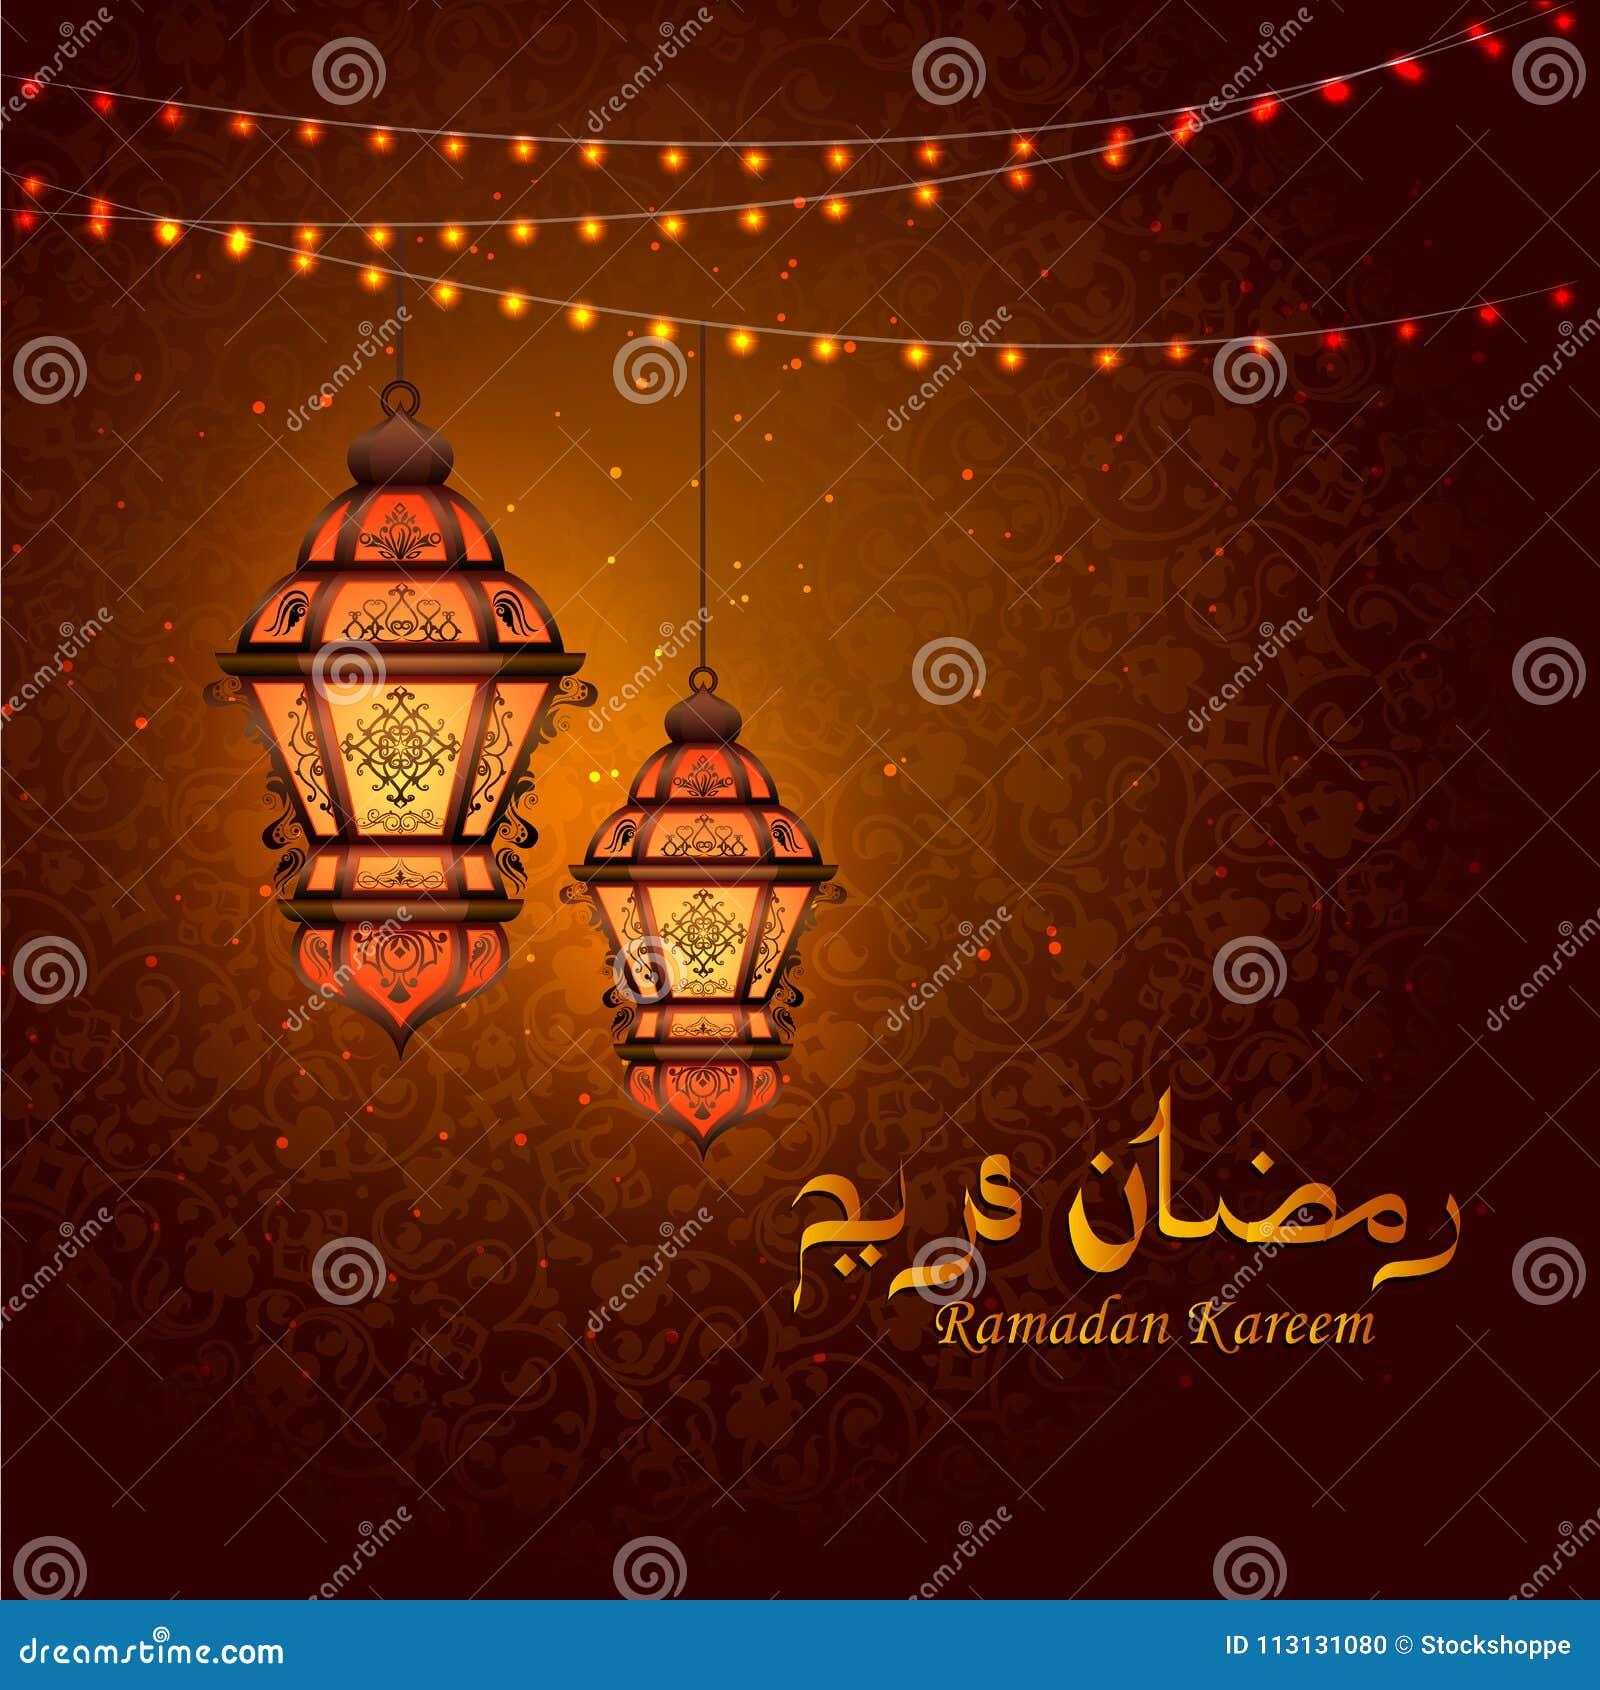 Illuminated Lamp For Ramadan Kareem Greetings For Ramadan Background